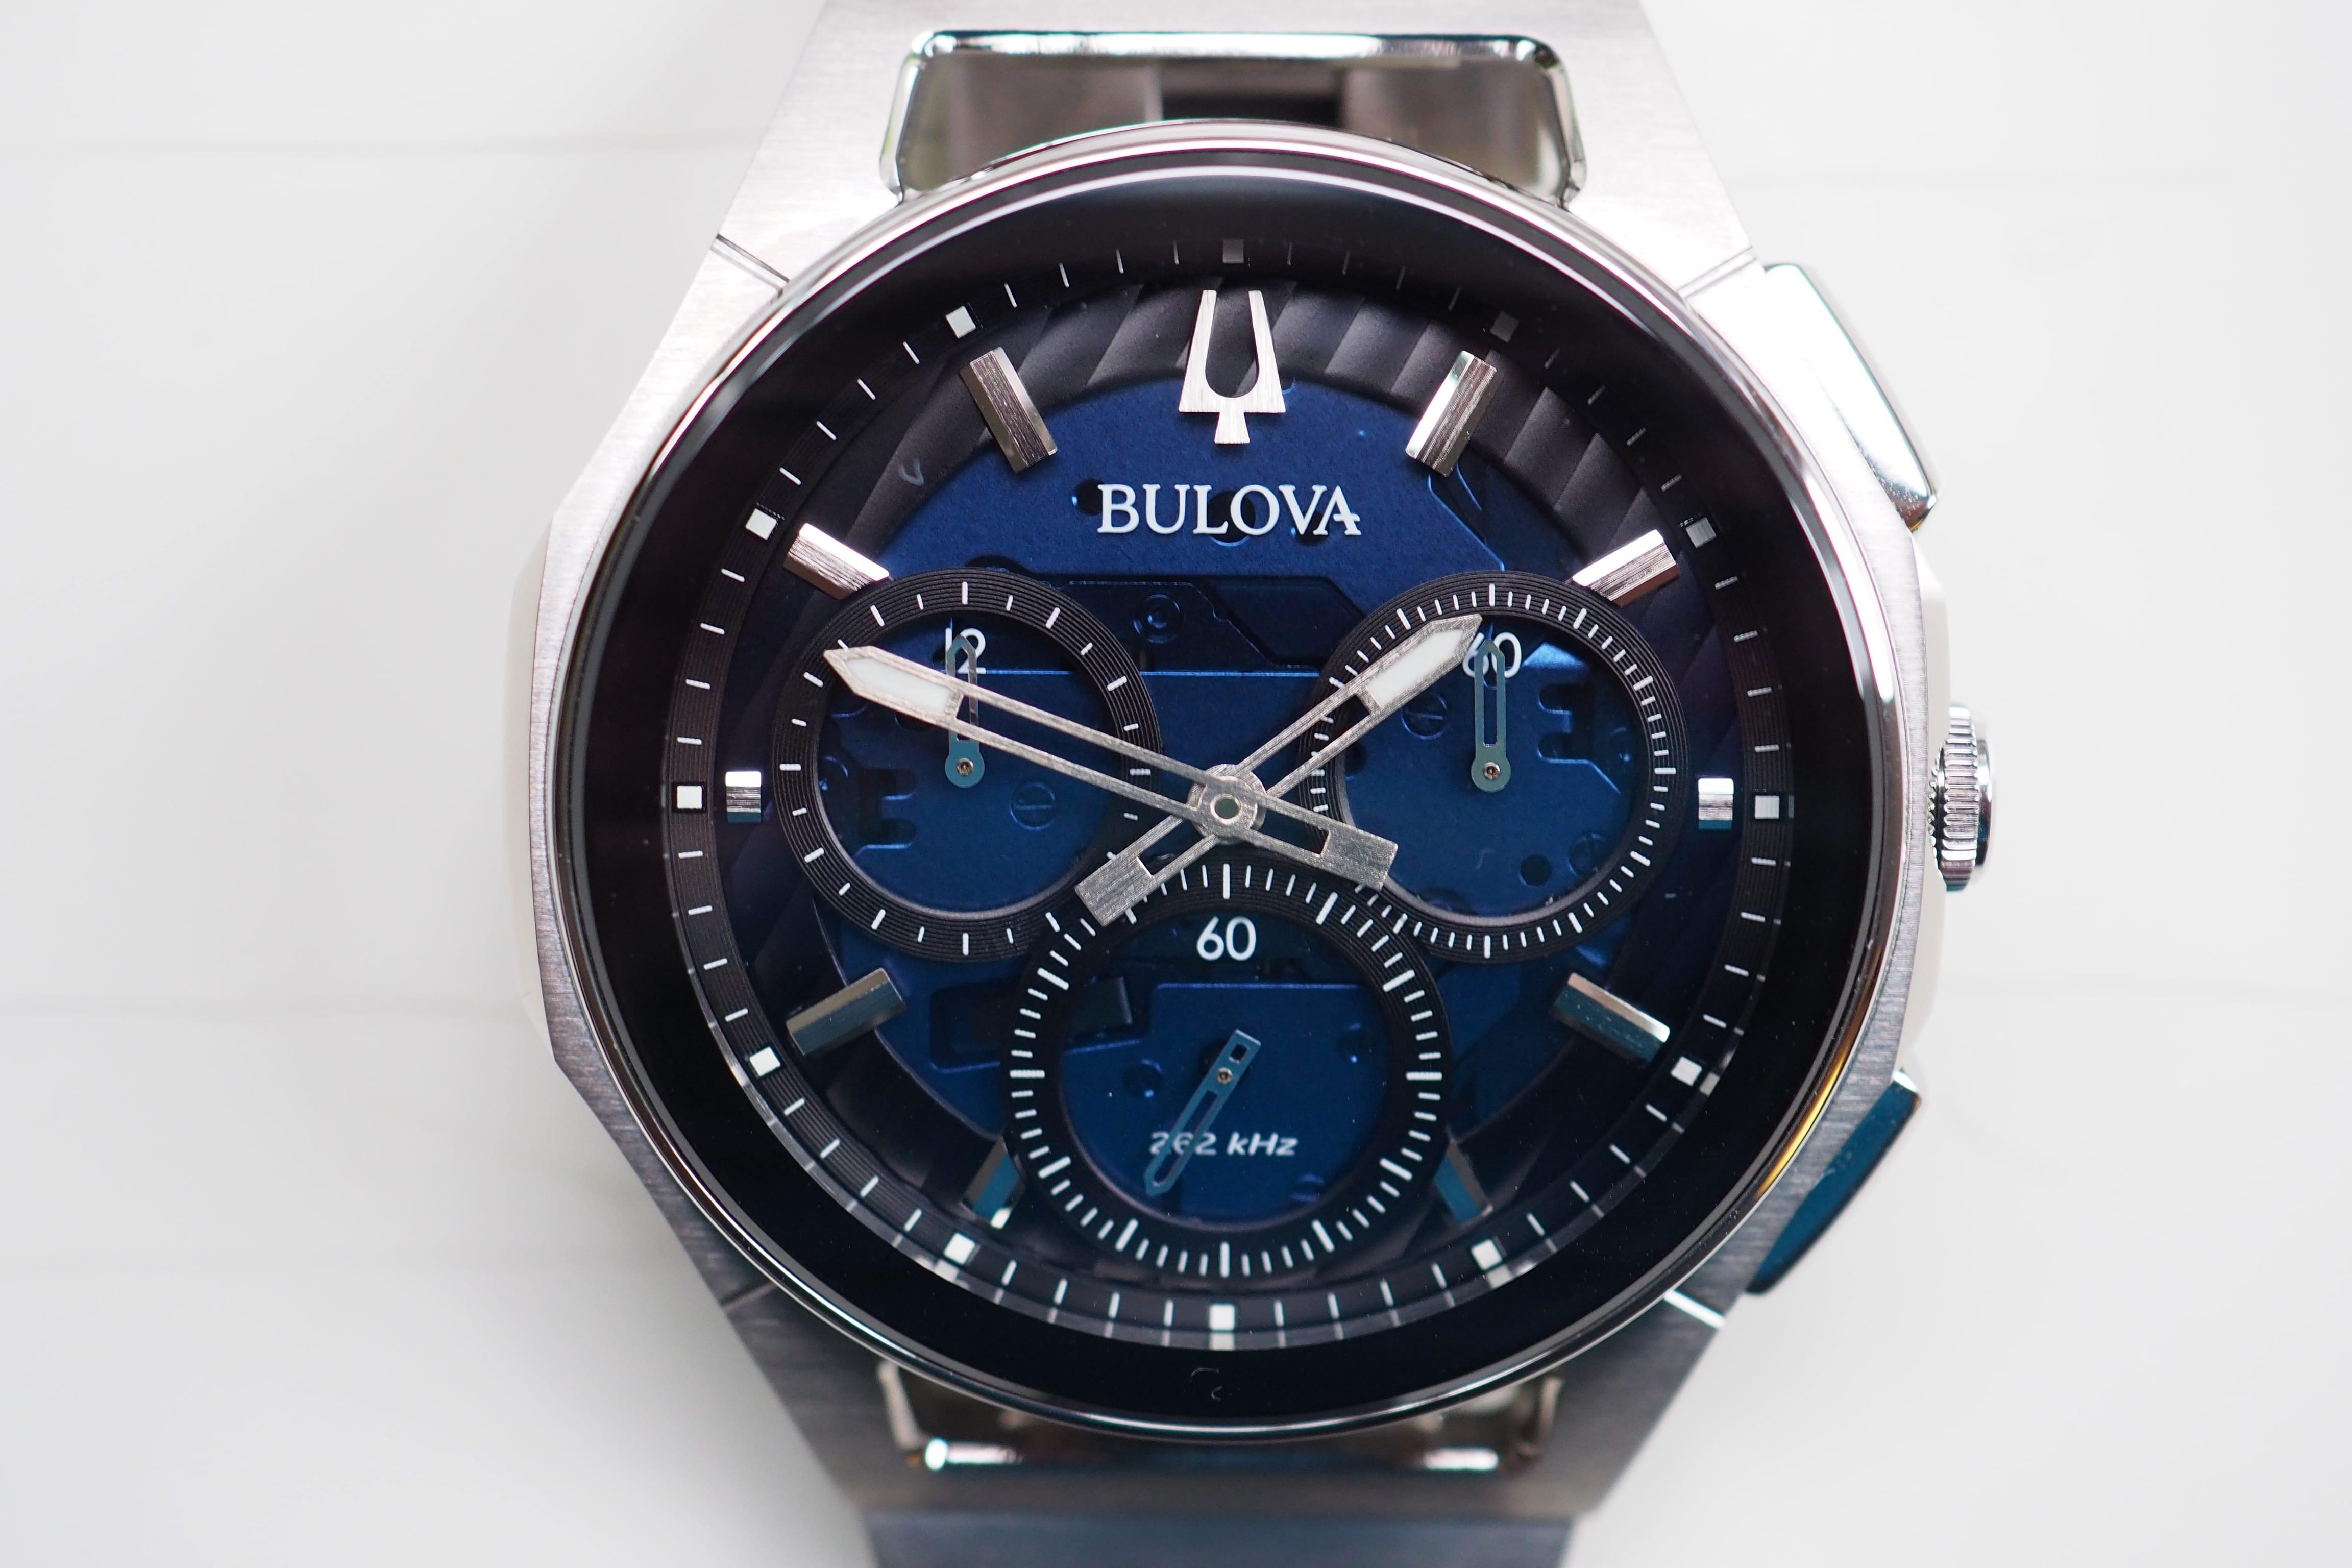 af6666693 Bulova Curv 96A205 Watch Review - WatchReviewBlog